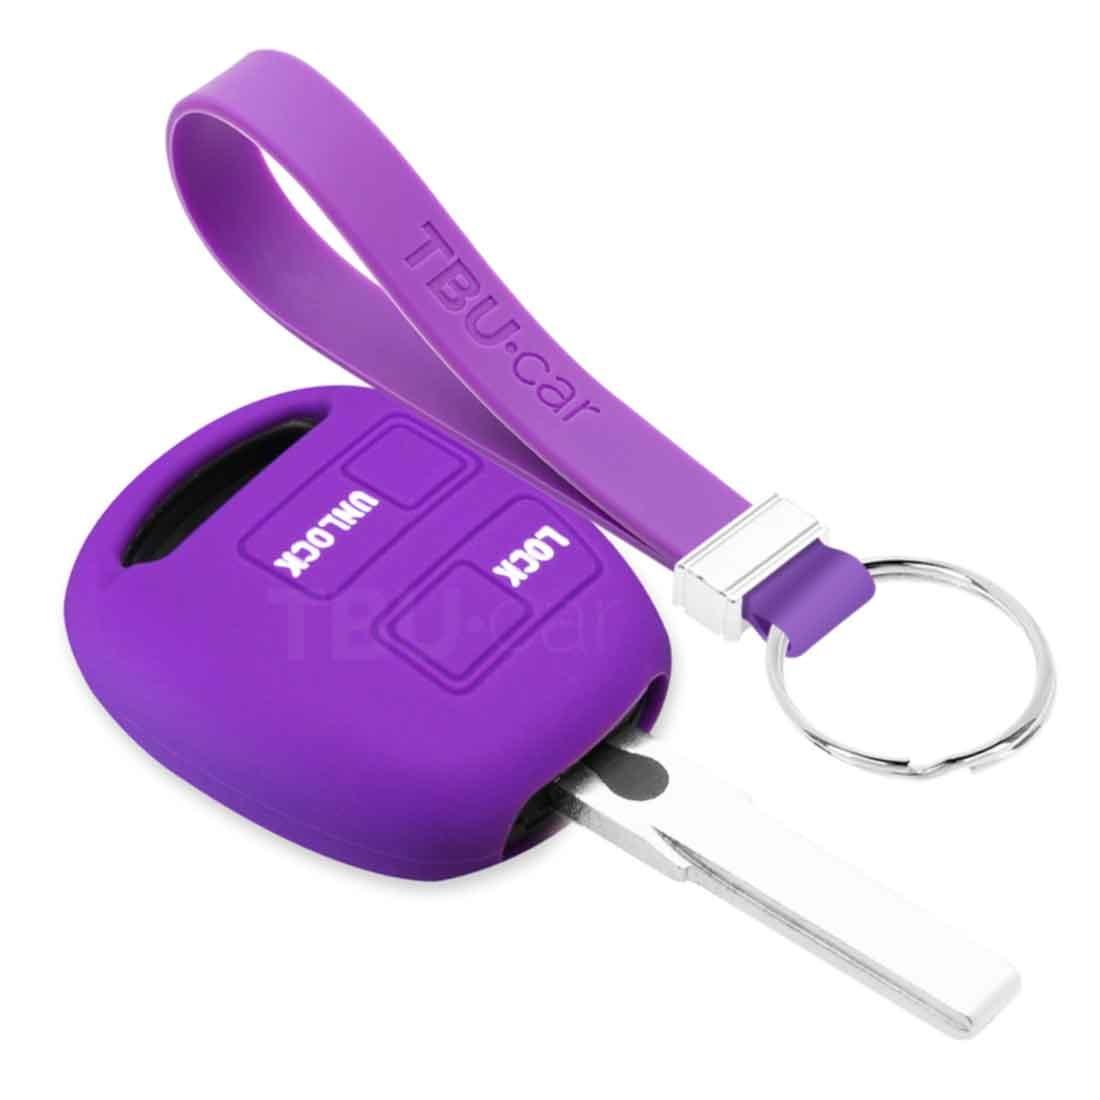 TBU car TBU car Autoschlüssel Hülle kompatibel mit Lexus 2 Tasten - Schutzhülle aus Silikon - Auto Schlüsselhülle Cover in Violett